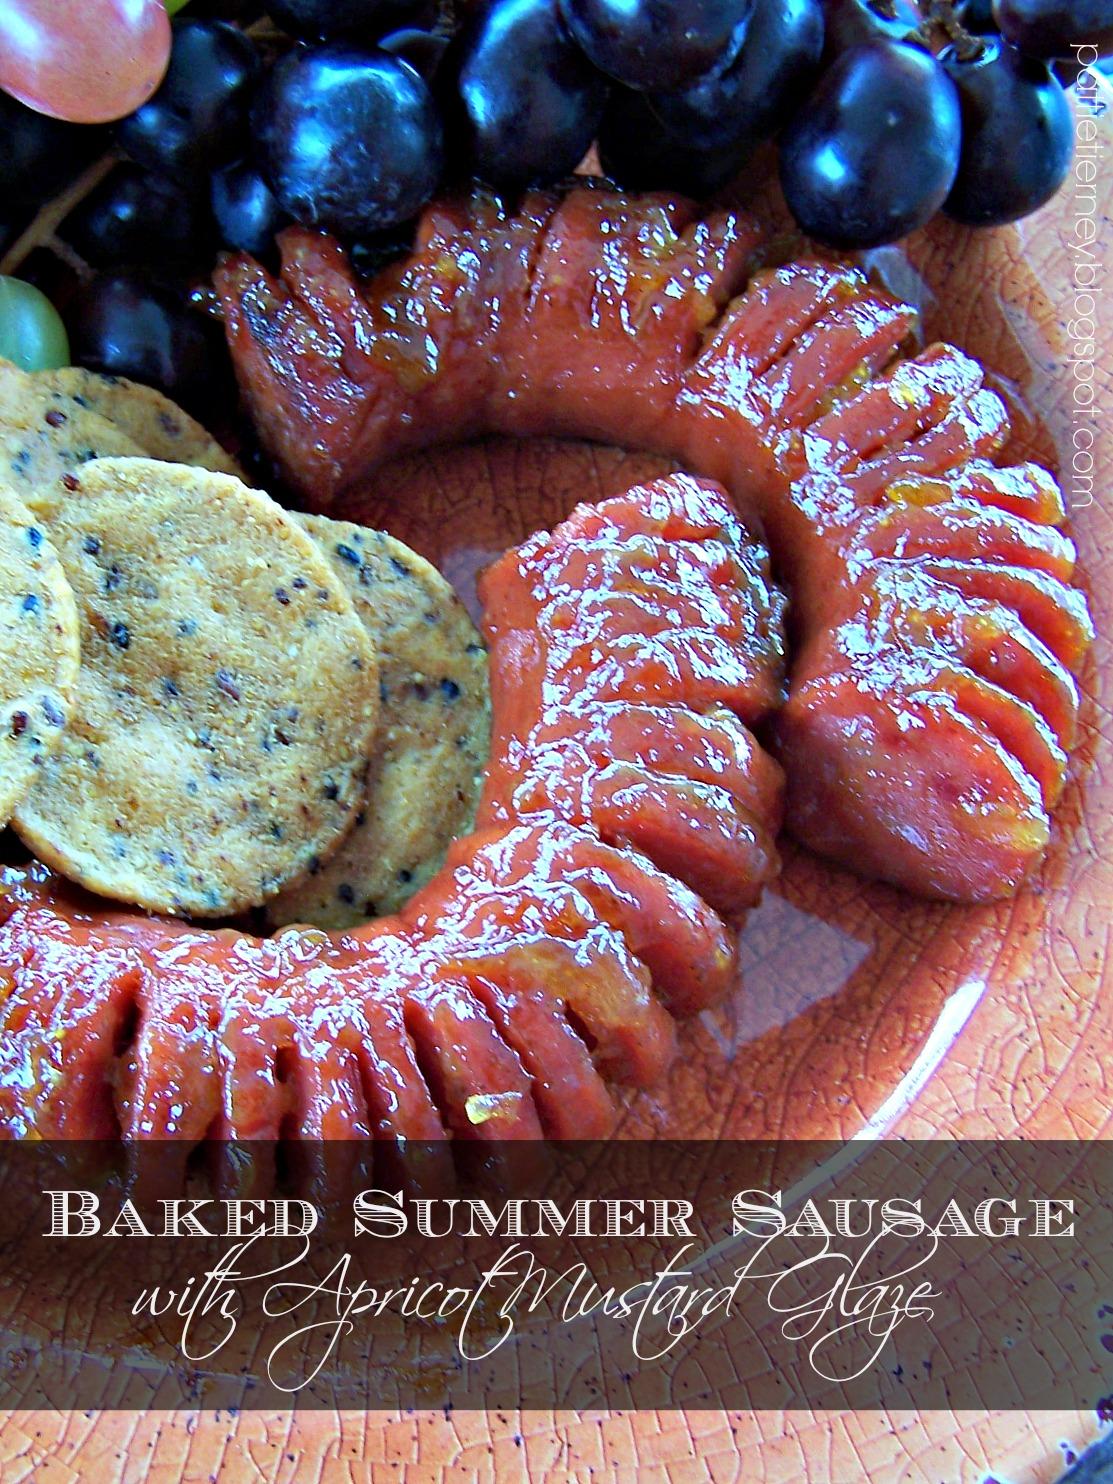 f30354e3a9a7 Olla-Podrida  Baked Summer Sausage with Apricot Mustard Glaze